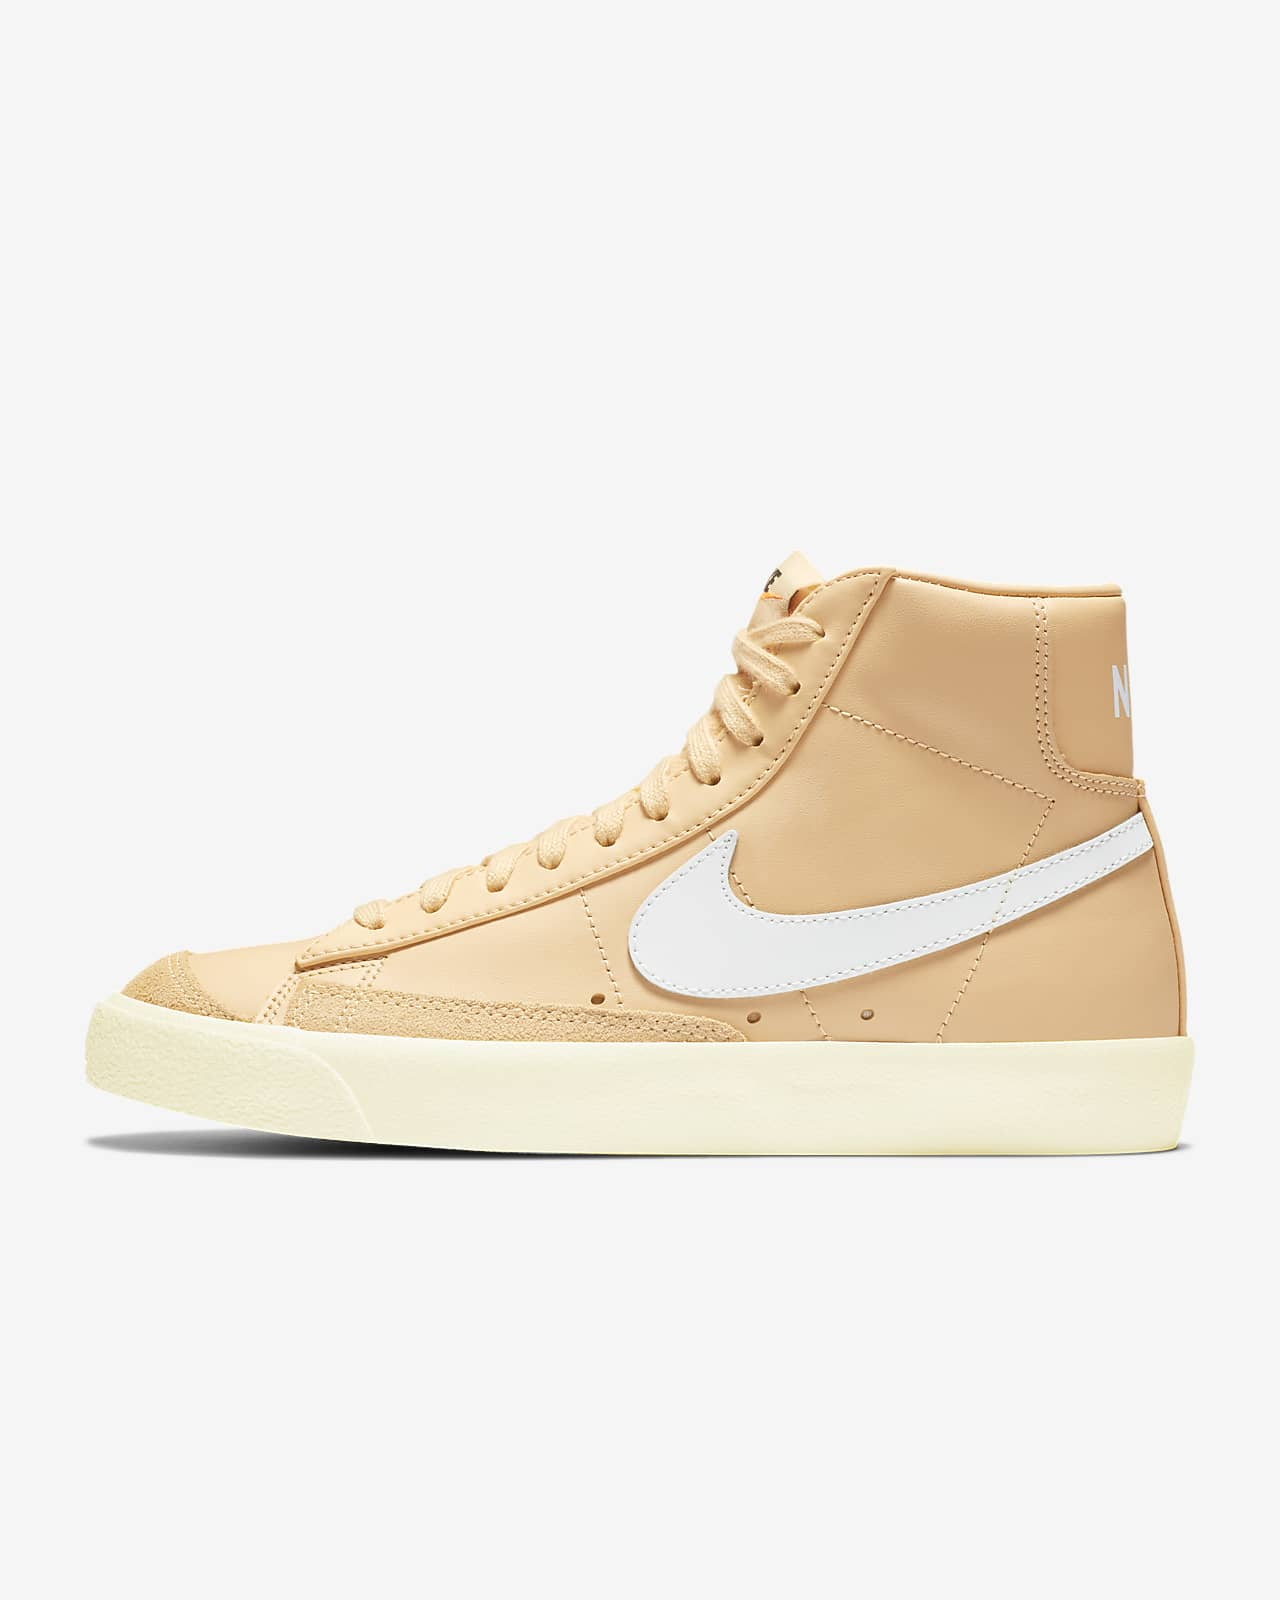 Sko Nike Blazer Mid '77 Vintage för kvinnor